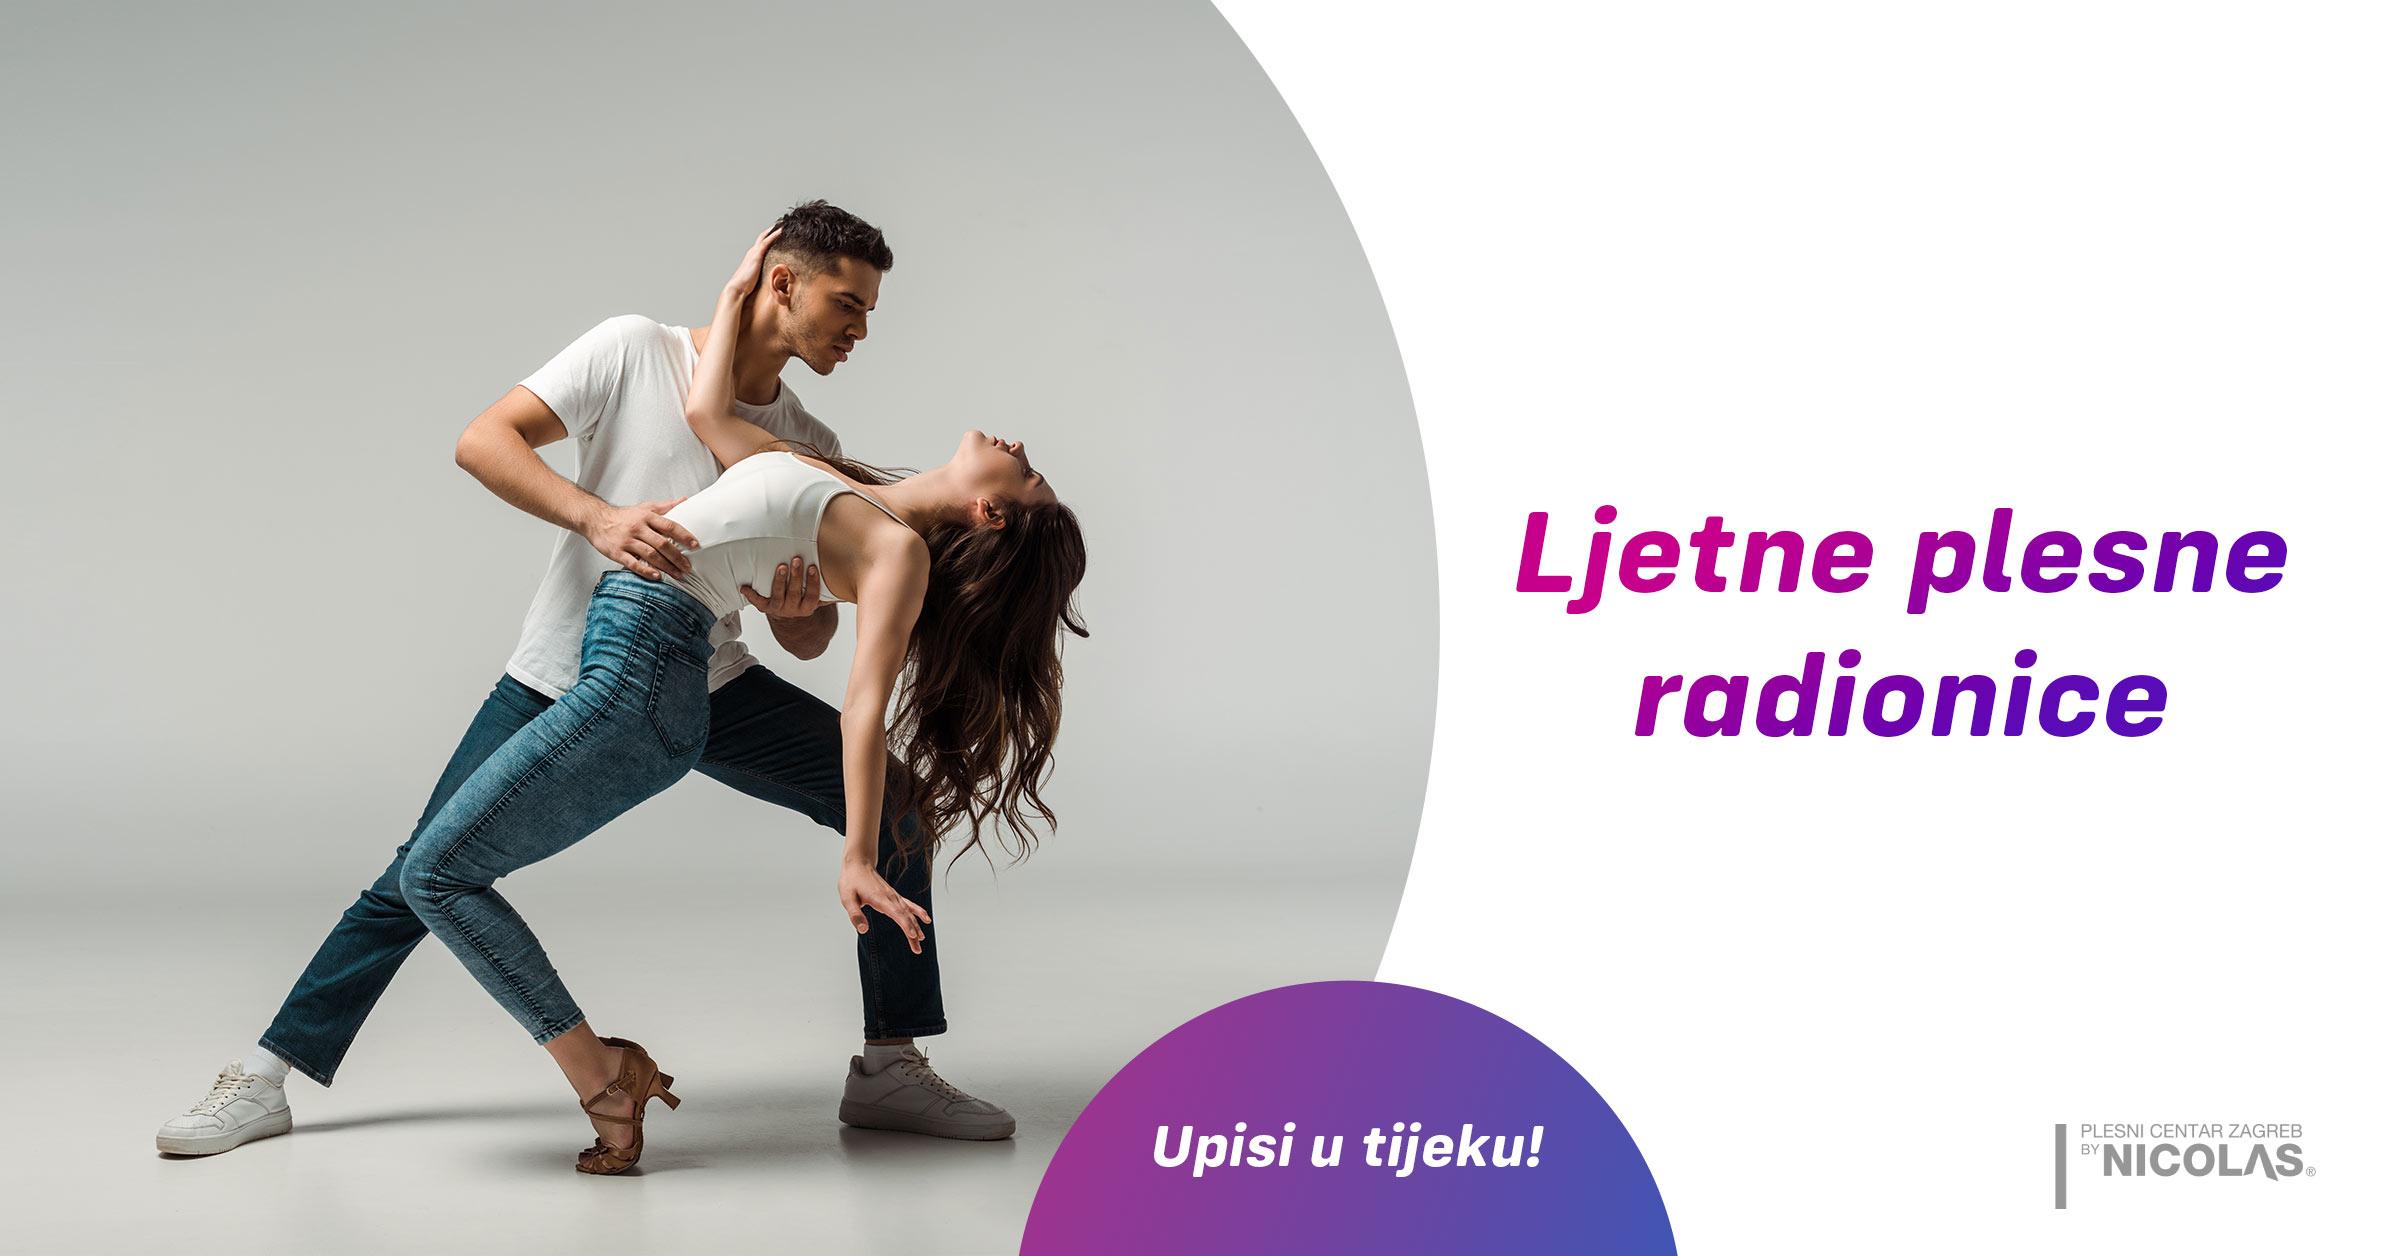 Ljetne plesne radionice